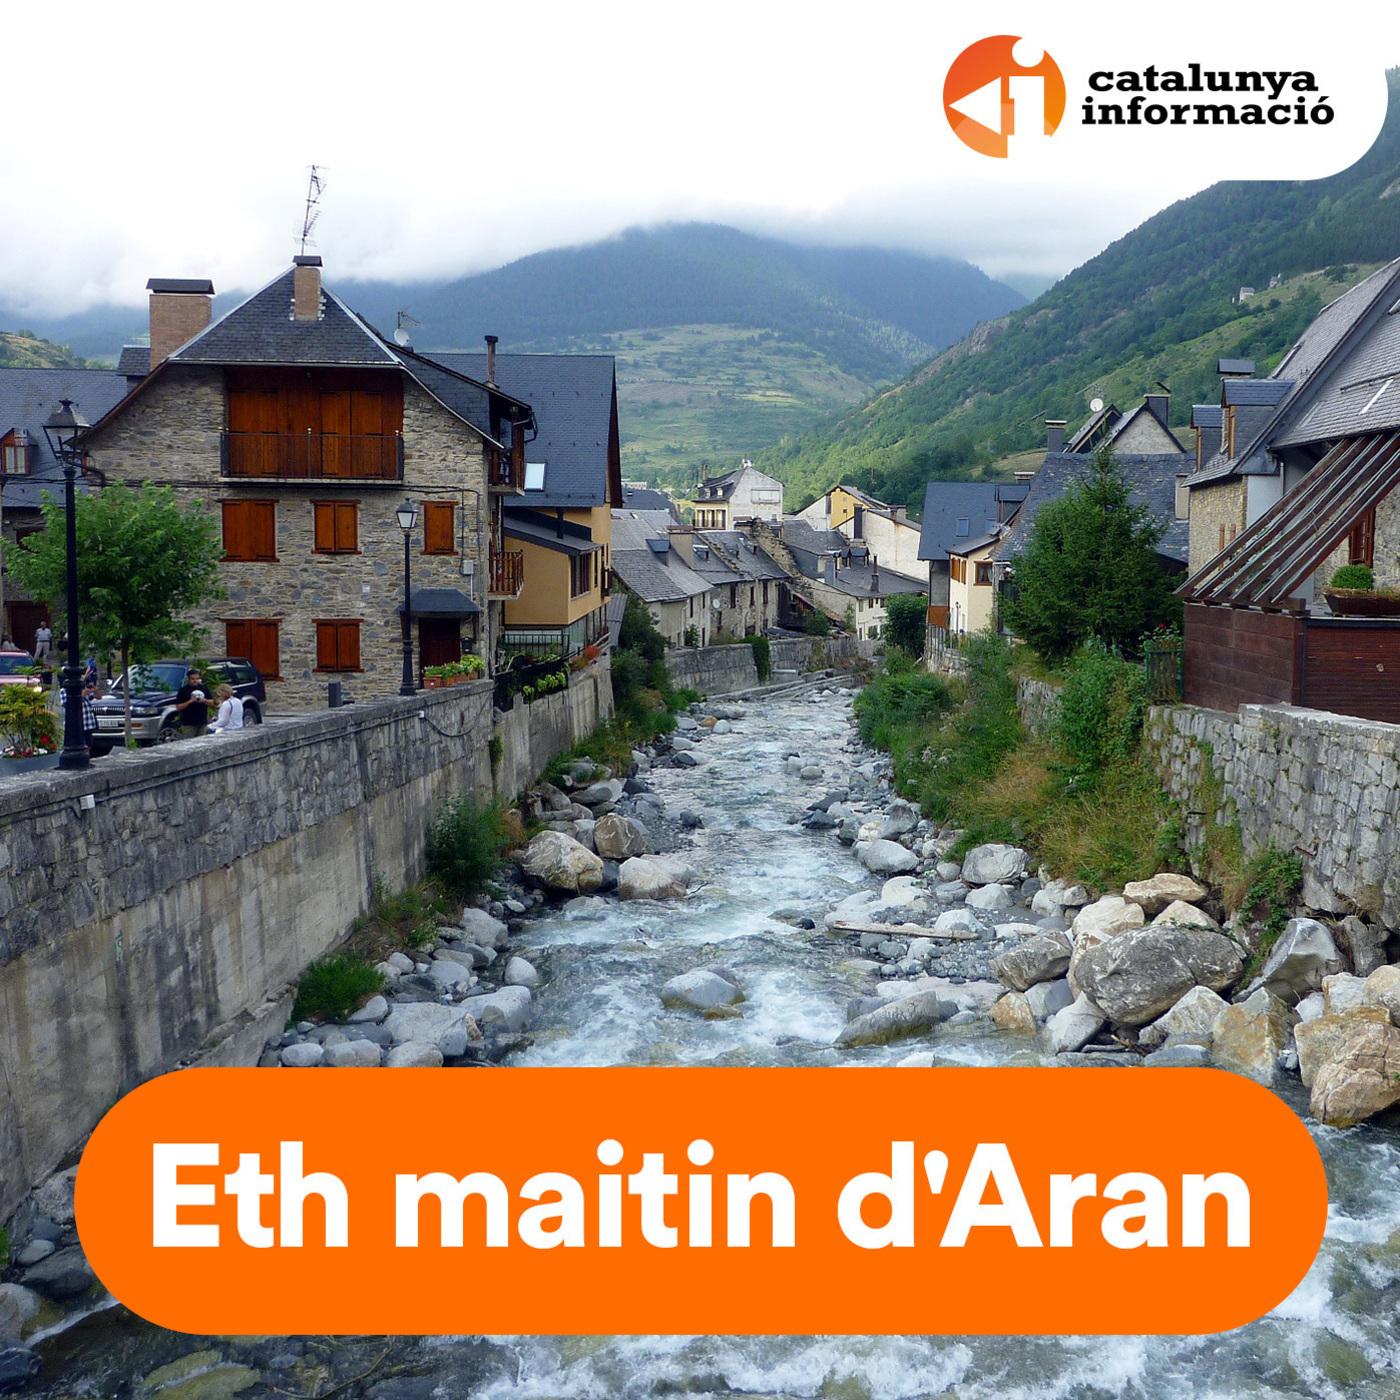 Eth maitin d'Aran - 28/01/2020